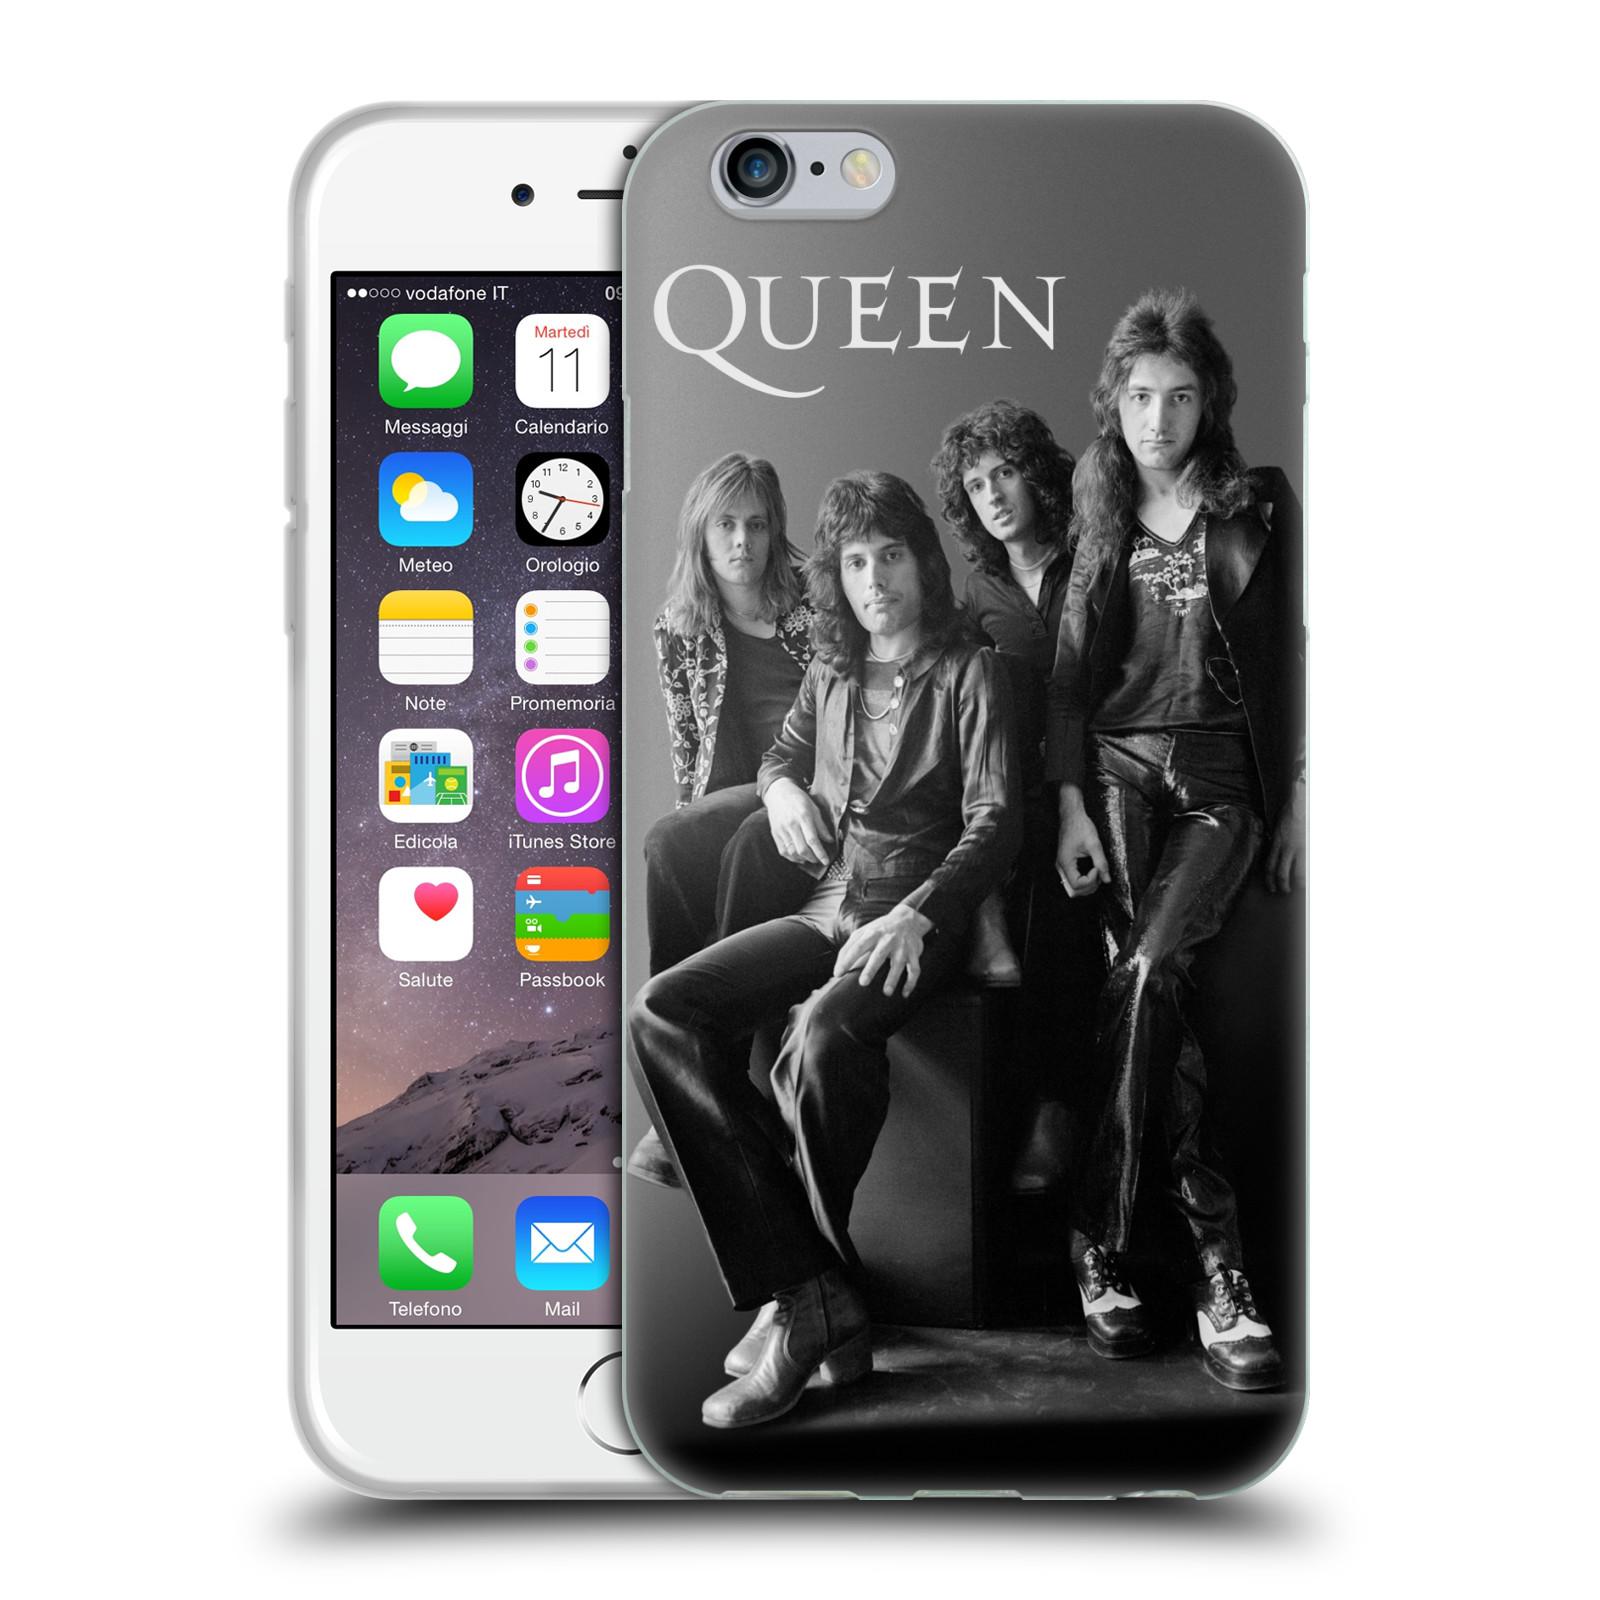 Silikonové pouzdro na mobil Apple iPhone 6 HEAD CASE Queen - Skupina